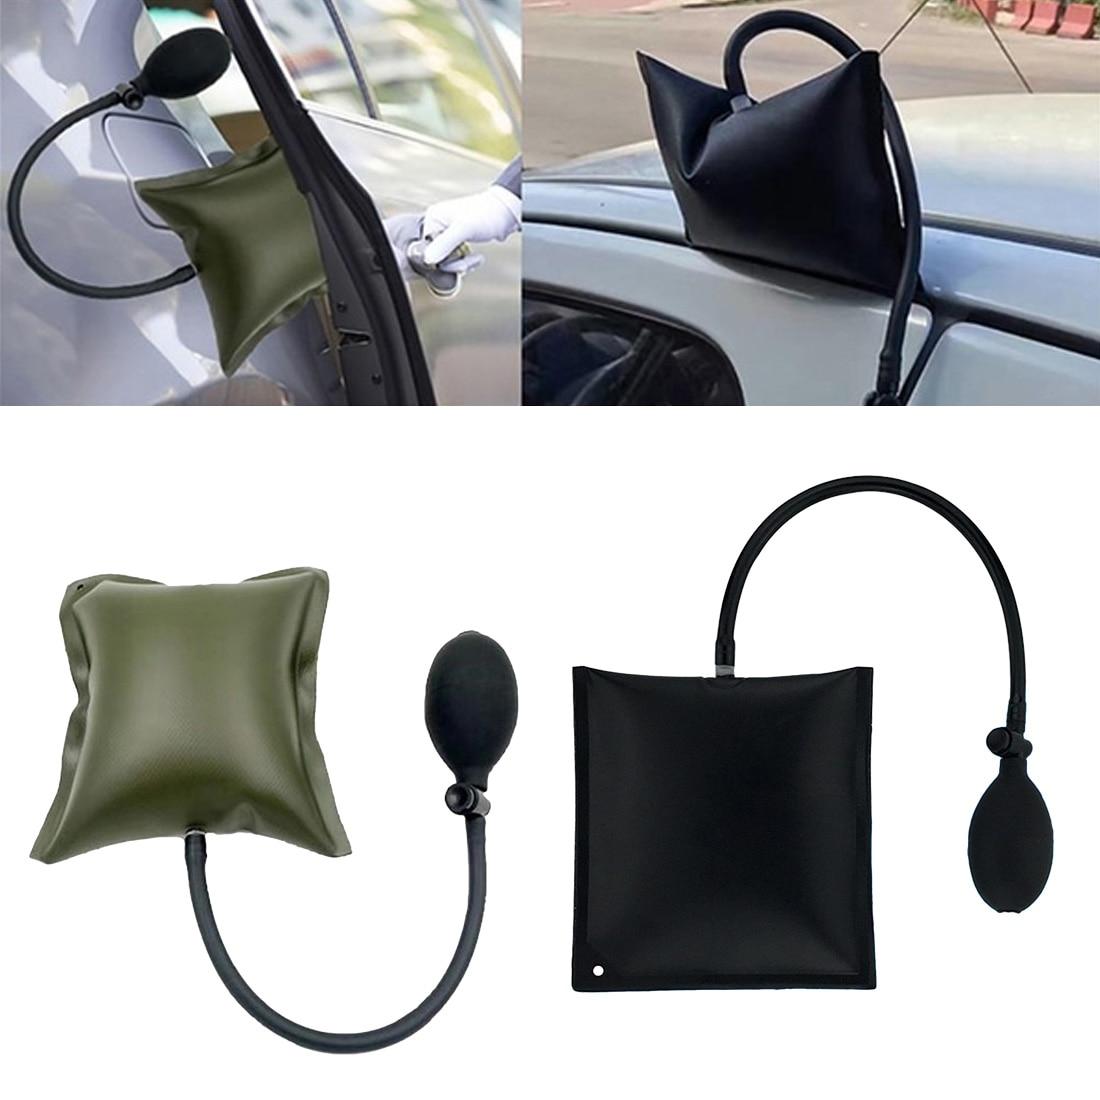 Hand Tools Pick Set Pump Wedge Locksmith Open Car Door Auto Air Wedge Airbag Window Repair Supplies